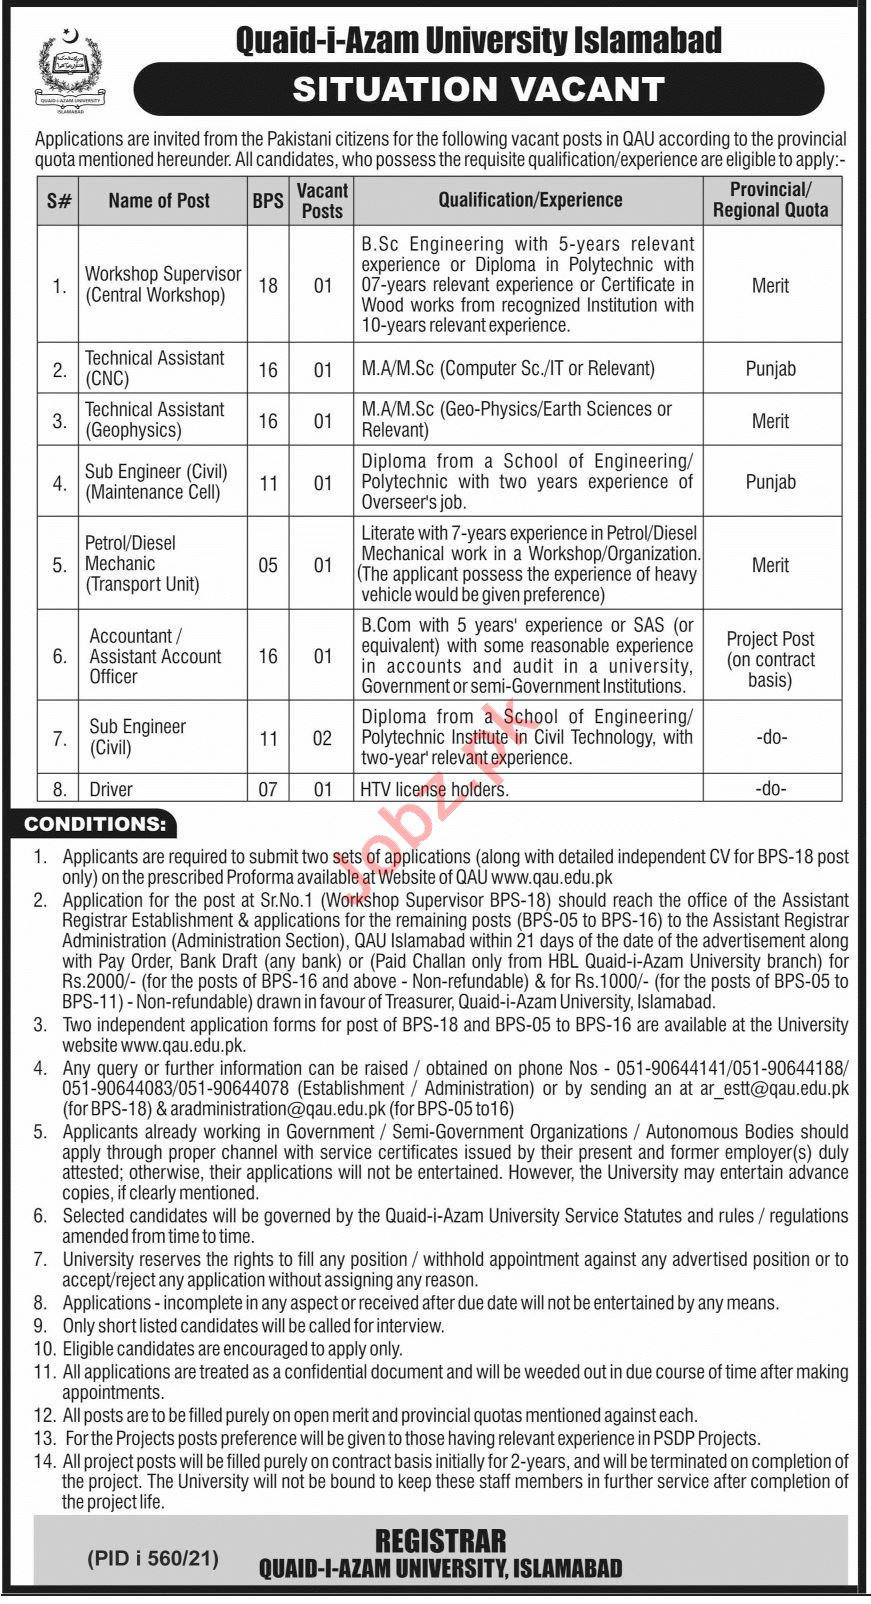 QAU University Islamabad Jobs 2021 for Assistant & Engineer